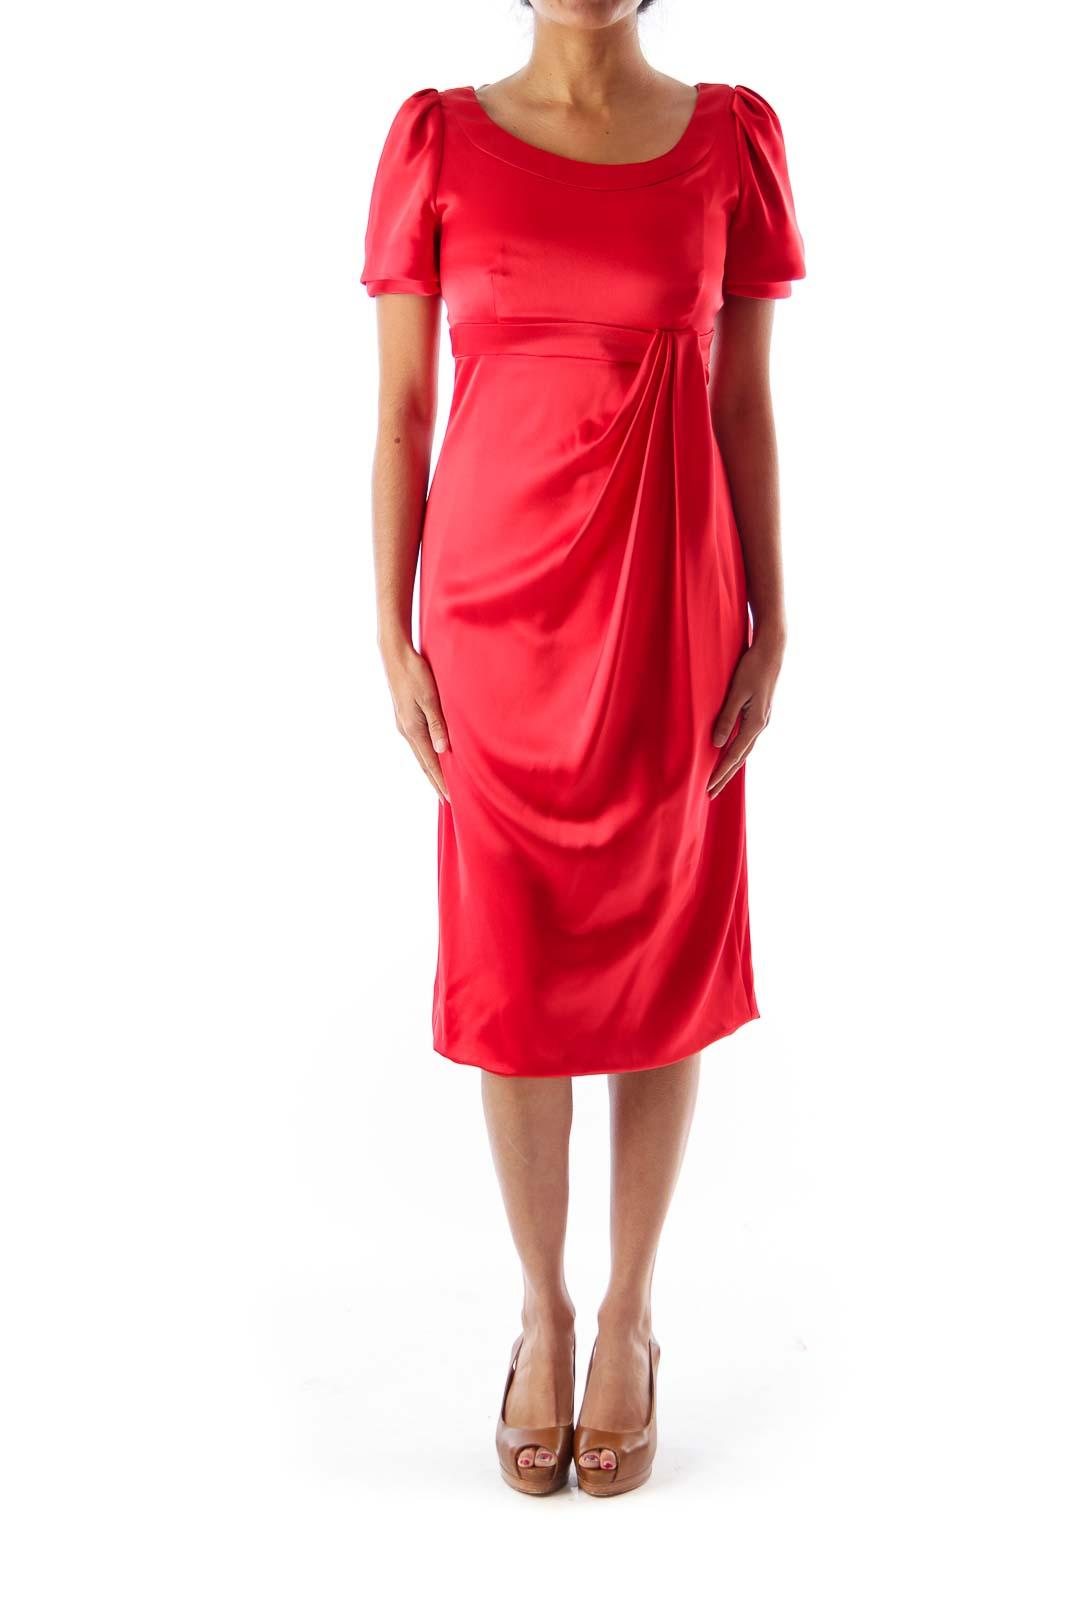 Red Empire Dress